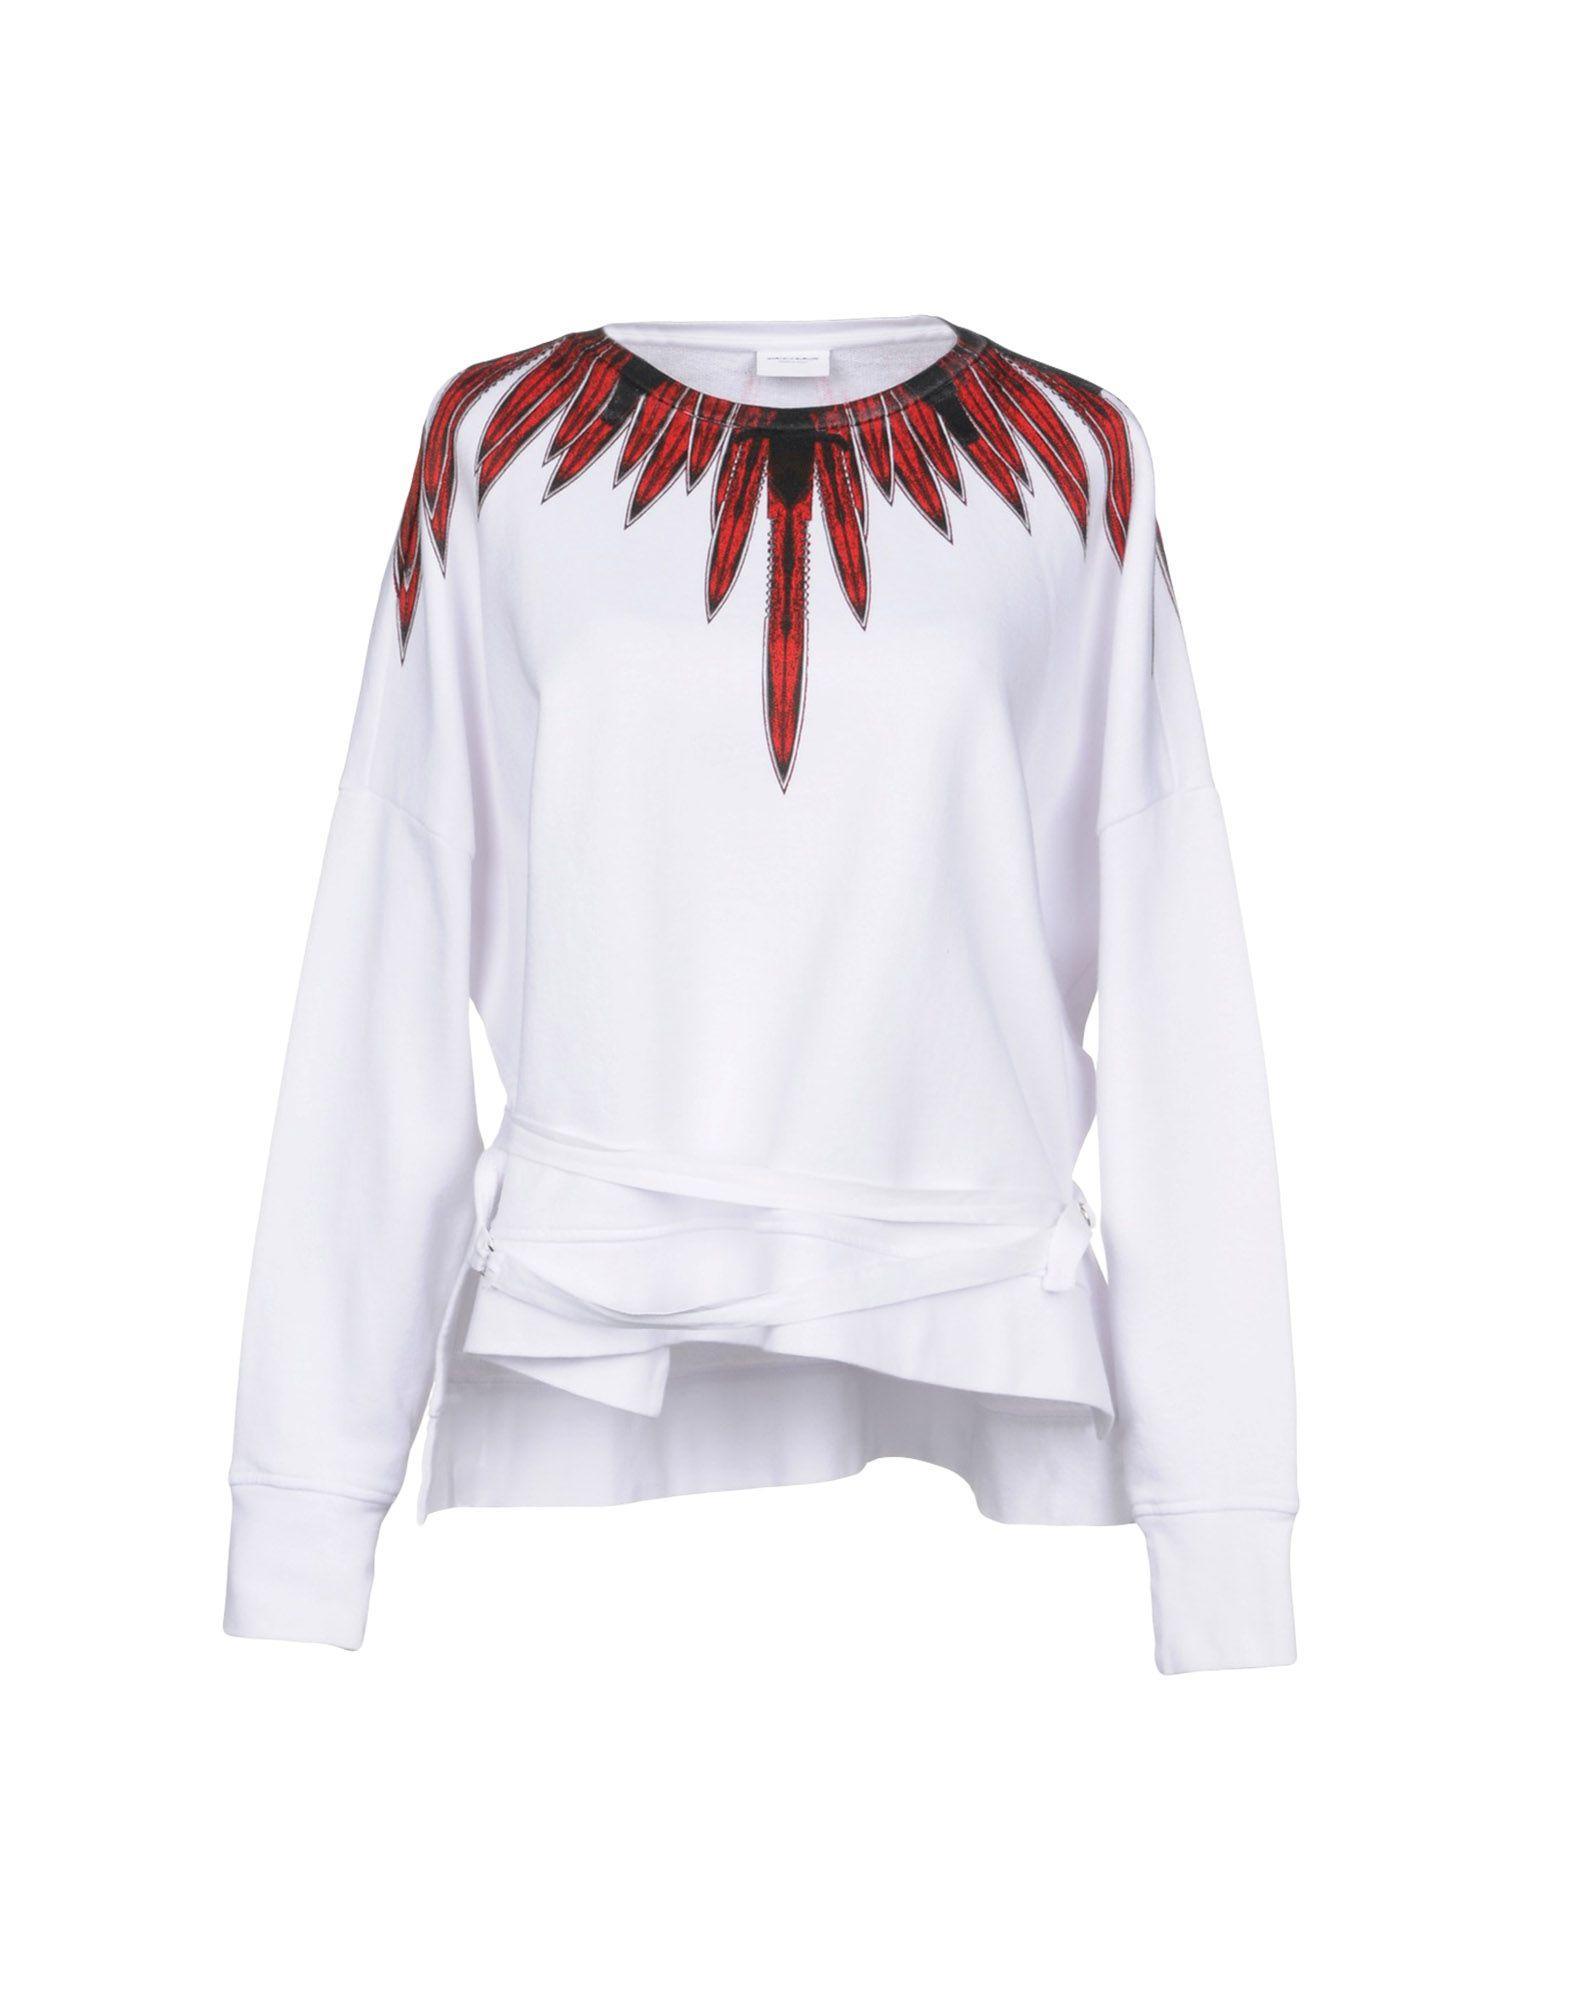 9bacc9eba3a Marcelo Burlon County Of Milan Sweatshirts In White